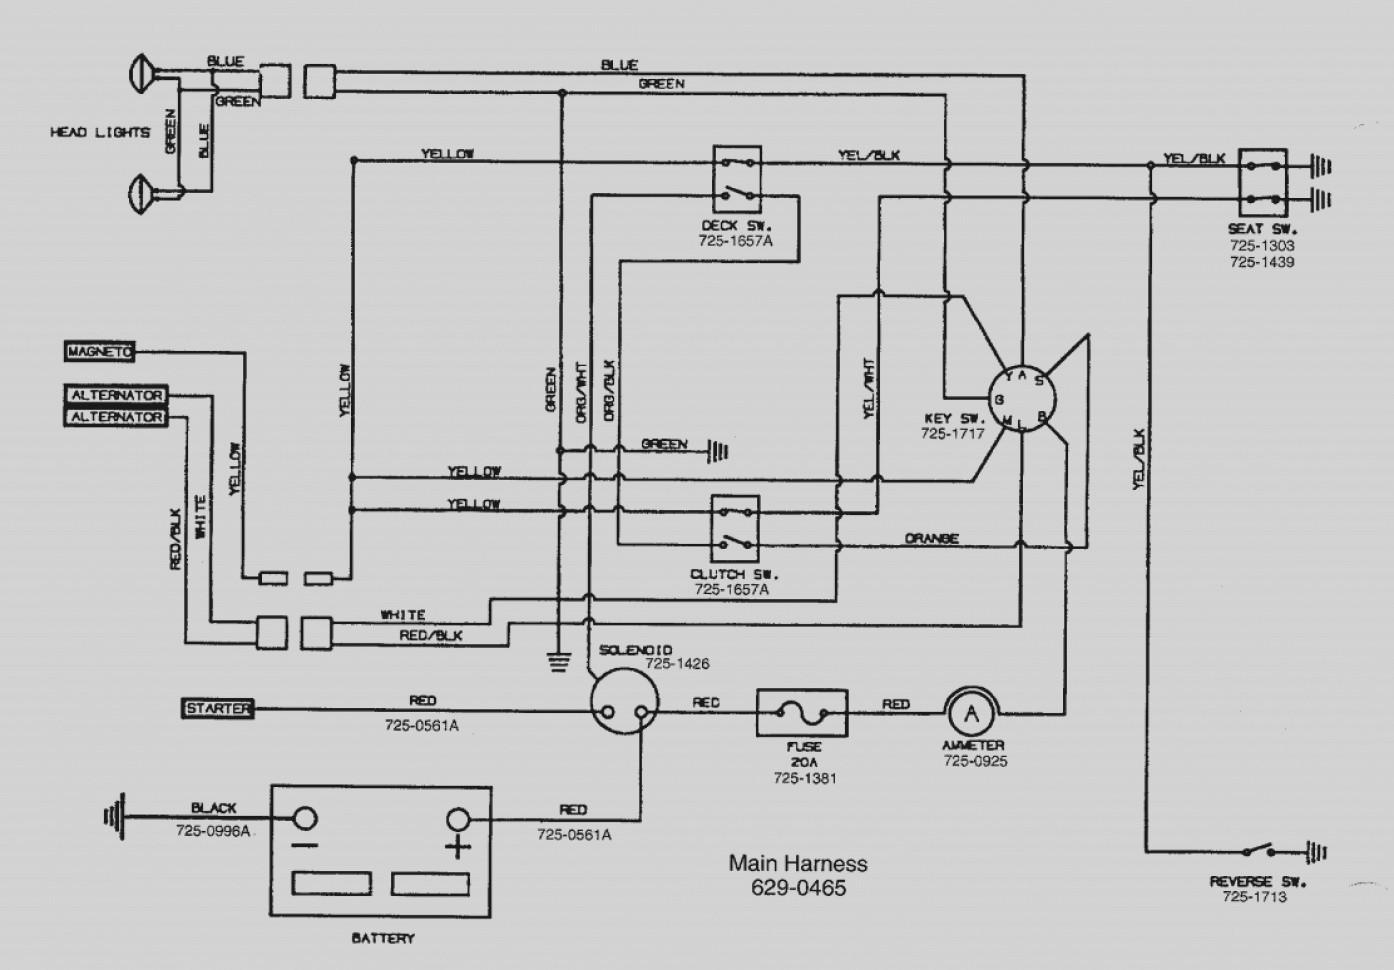 electrical wiring diagram for yard machine wiring diagram data schemamtd wiring diagram model 13as679g062 wiring diagram g11 electrical wiring diagram for yard machine